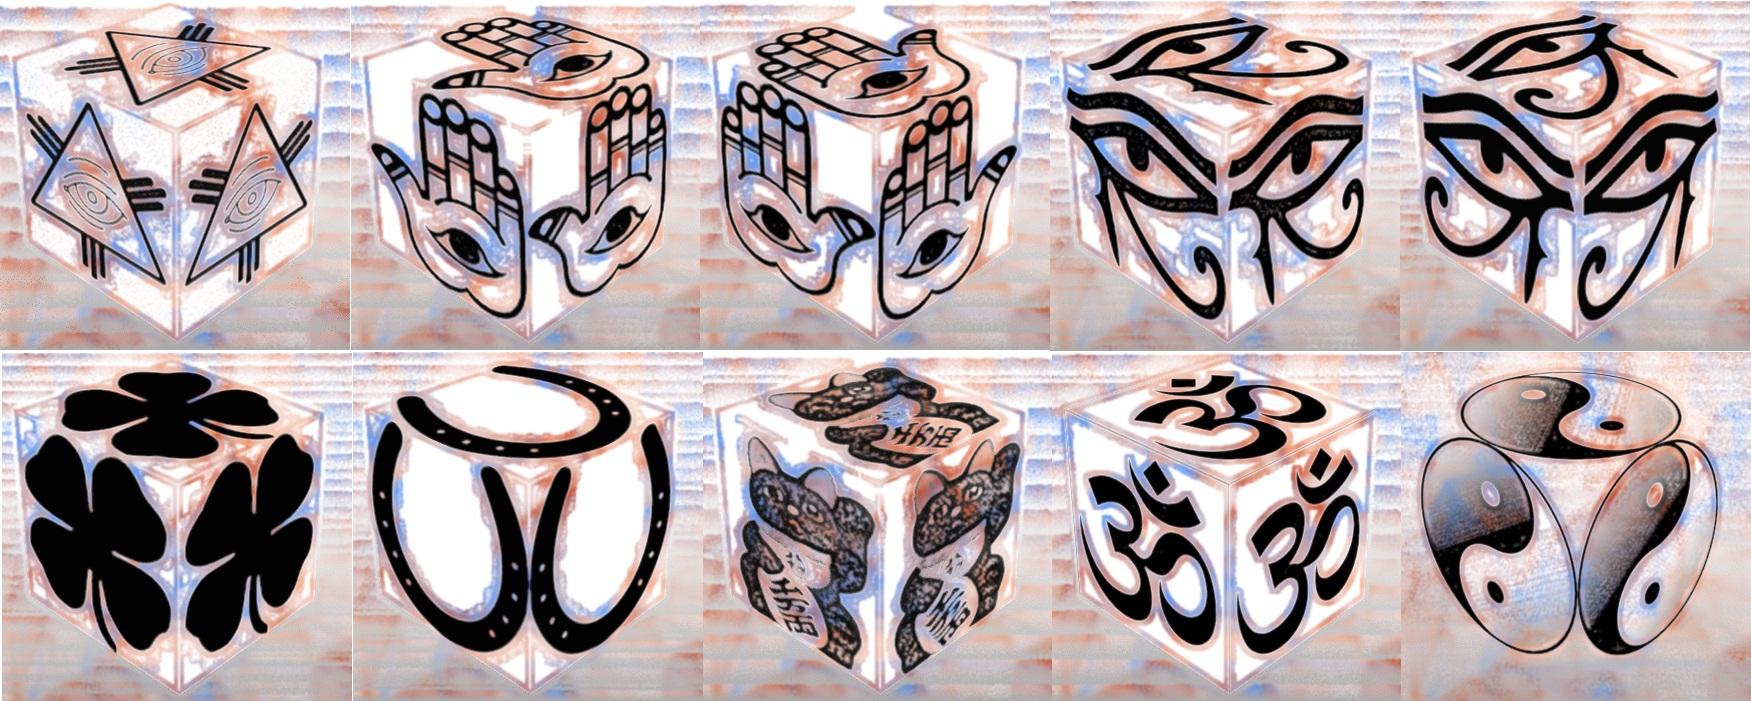 cube, 3d cube, lucky dice, luck symbols, Color Noise Eye of Fatima, Color Noise Eye of Providence, Color Noise Four Leaf Clover, Color Noise Horseshoe, Color Noise Maneki Neko